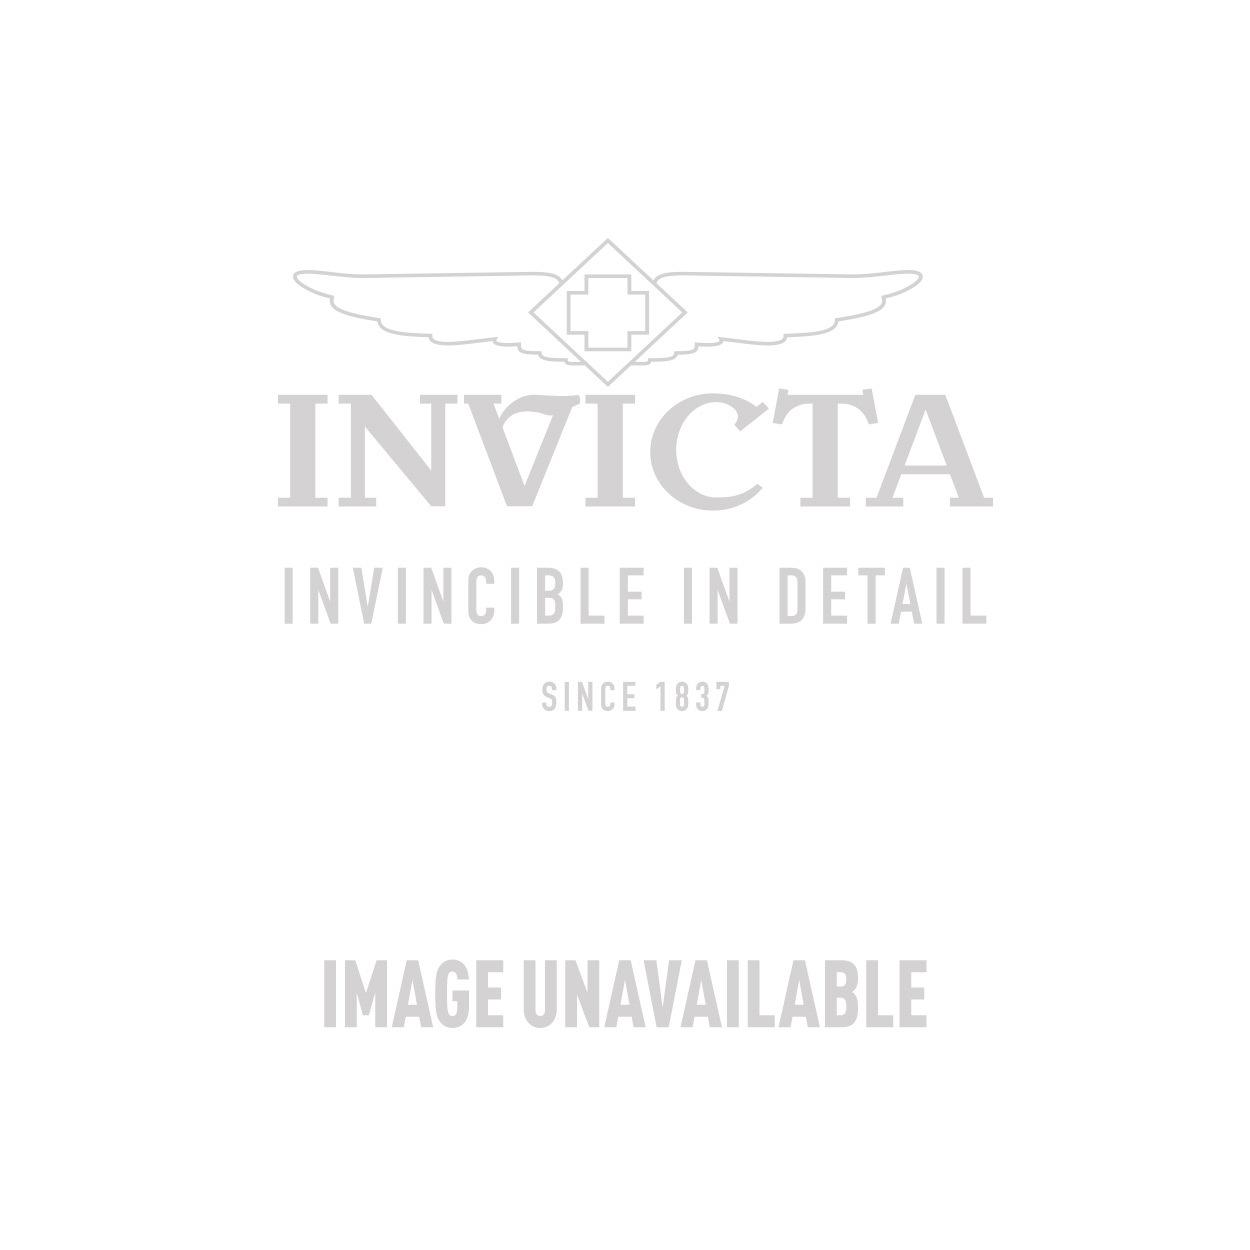 949c6866af4 Invicta Pro Diver Men s Automatic 40mm Gold